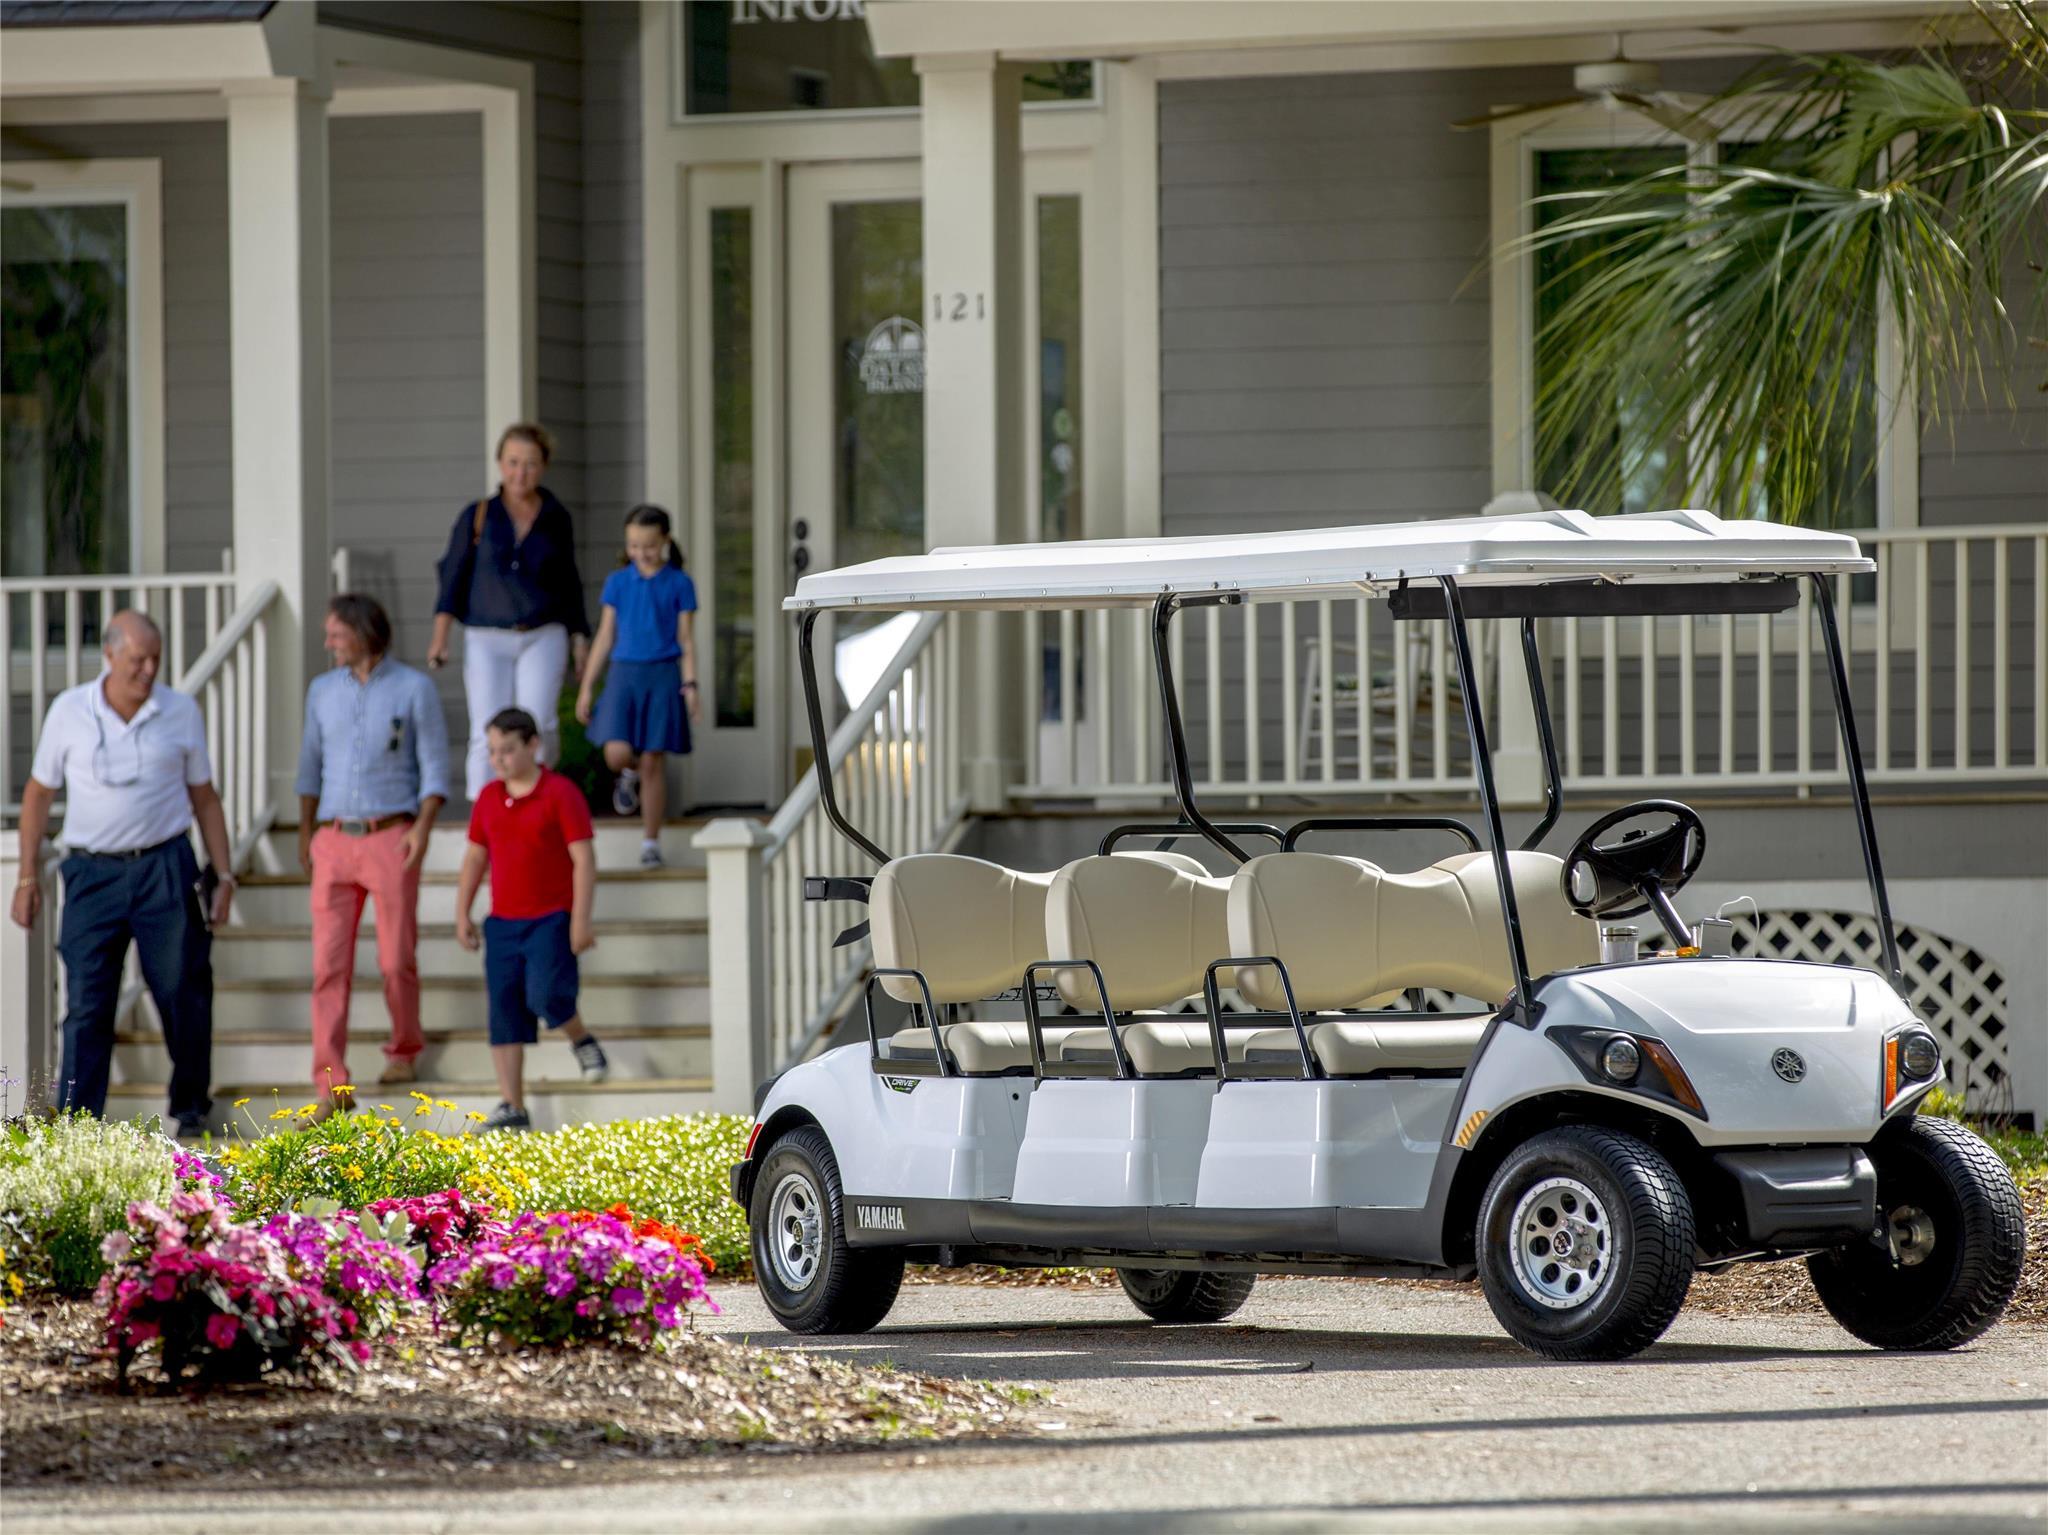 Golf Concierge 6 - Yamaha Golf Car on golf card, golf handicap, golf words, golf games, golf tools, golf accessories, golf trolley, golf hitting nets, golf girls, golf players, golf cartoons, golf buggy, golf machine,